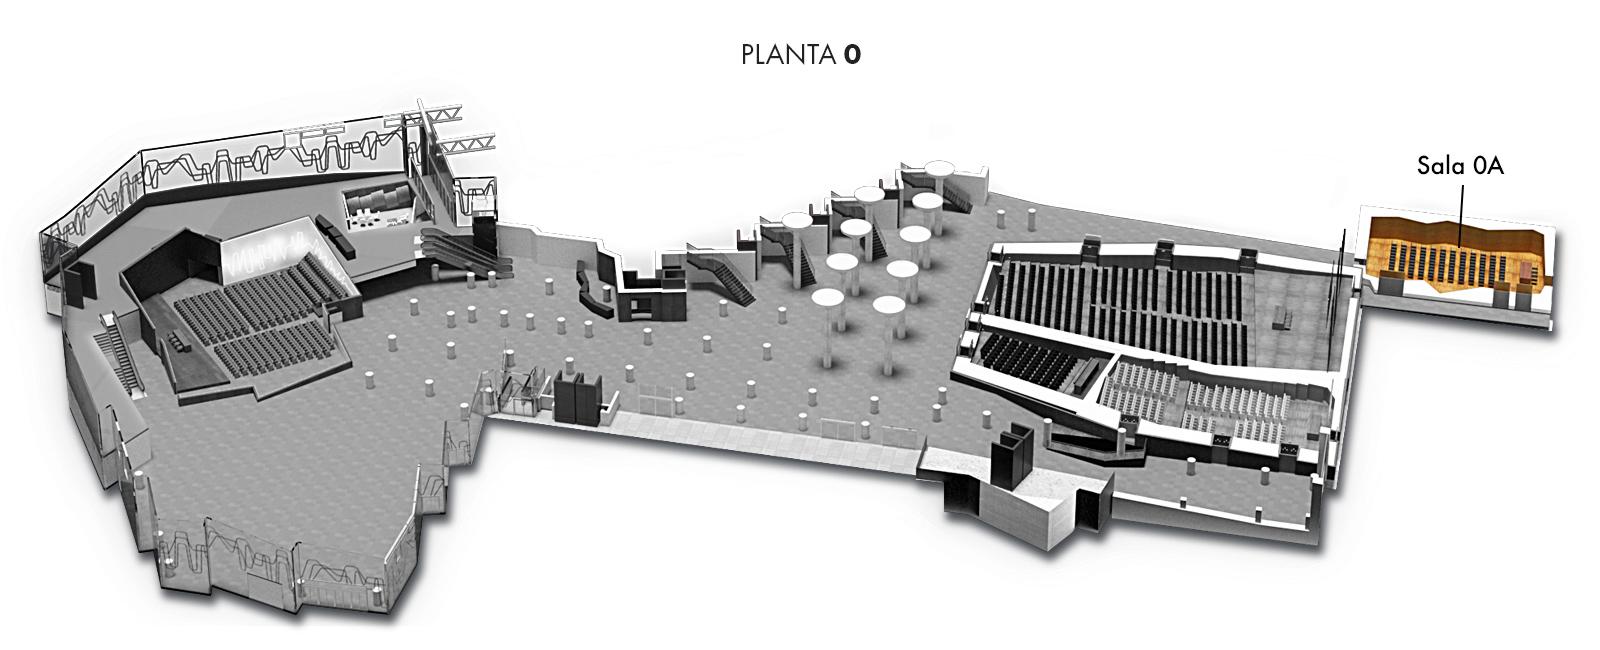 Sala 0A, Planta 0   Palacio Euskalduna Jauregia